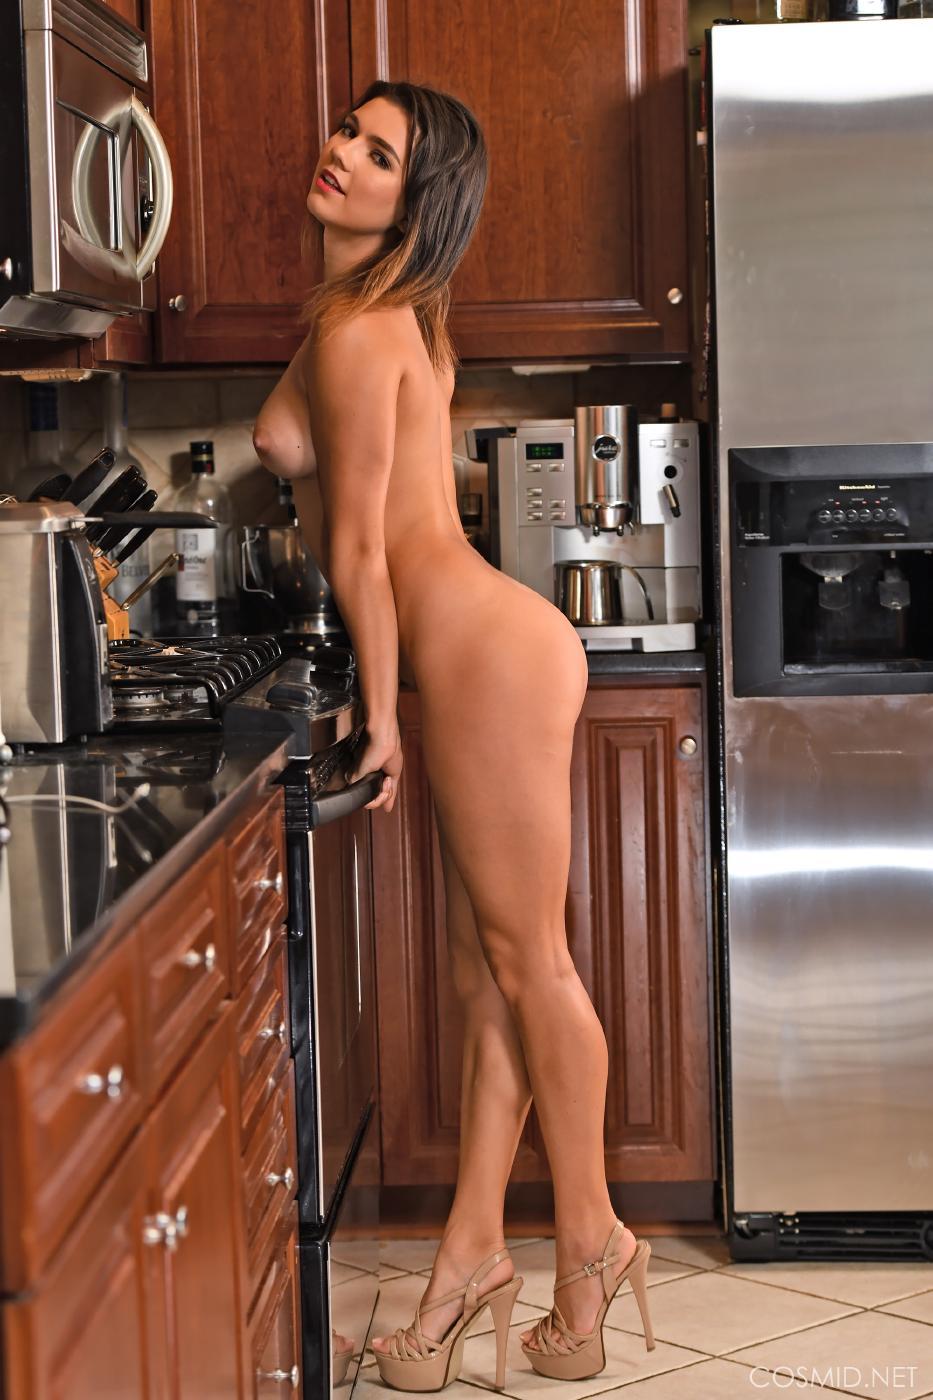 Dare Taylor Nude Kitchen Strip Set Leaked 0009